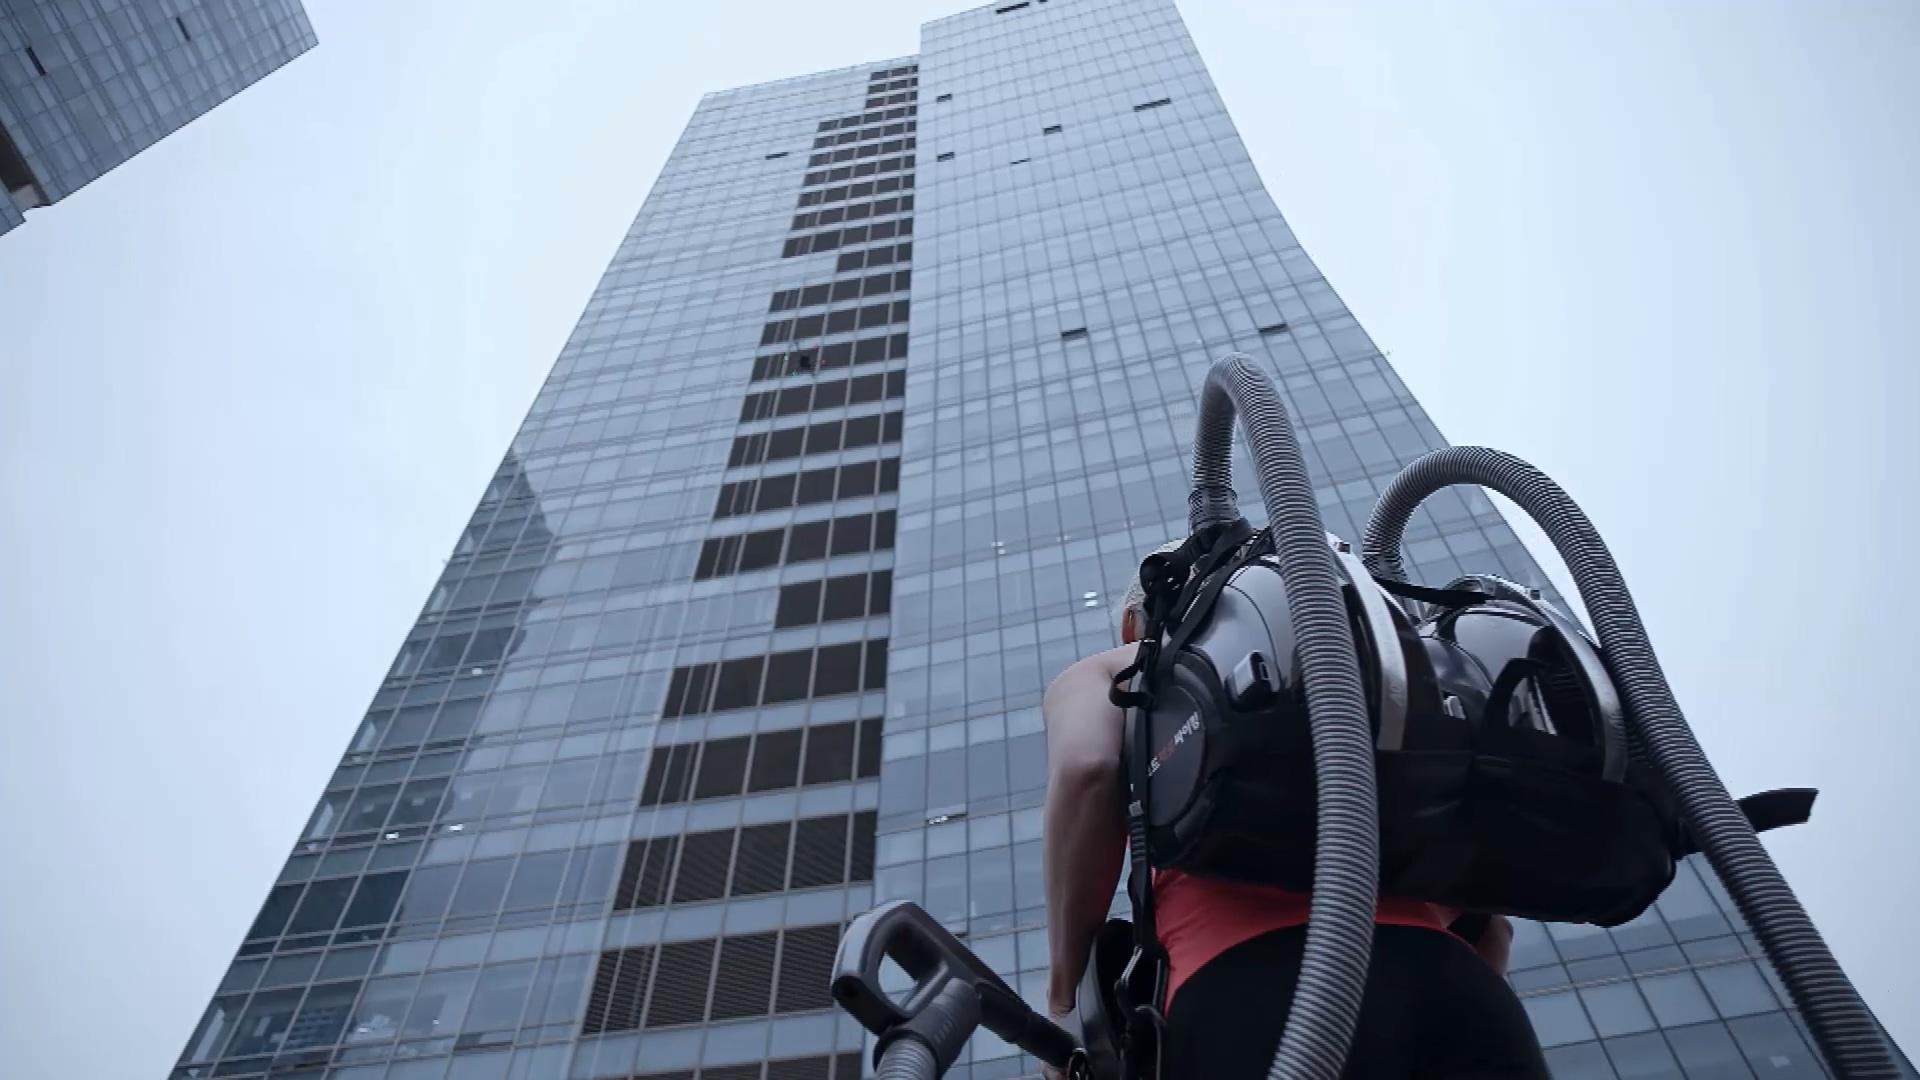 LG CordZero Climbing Stunt 1